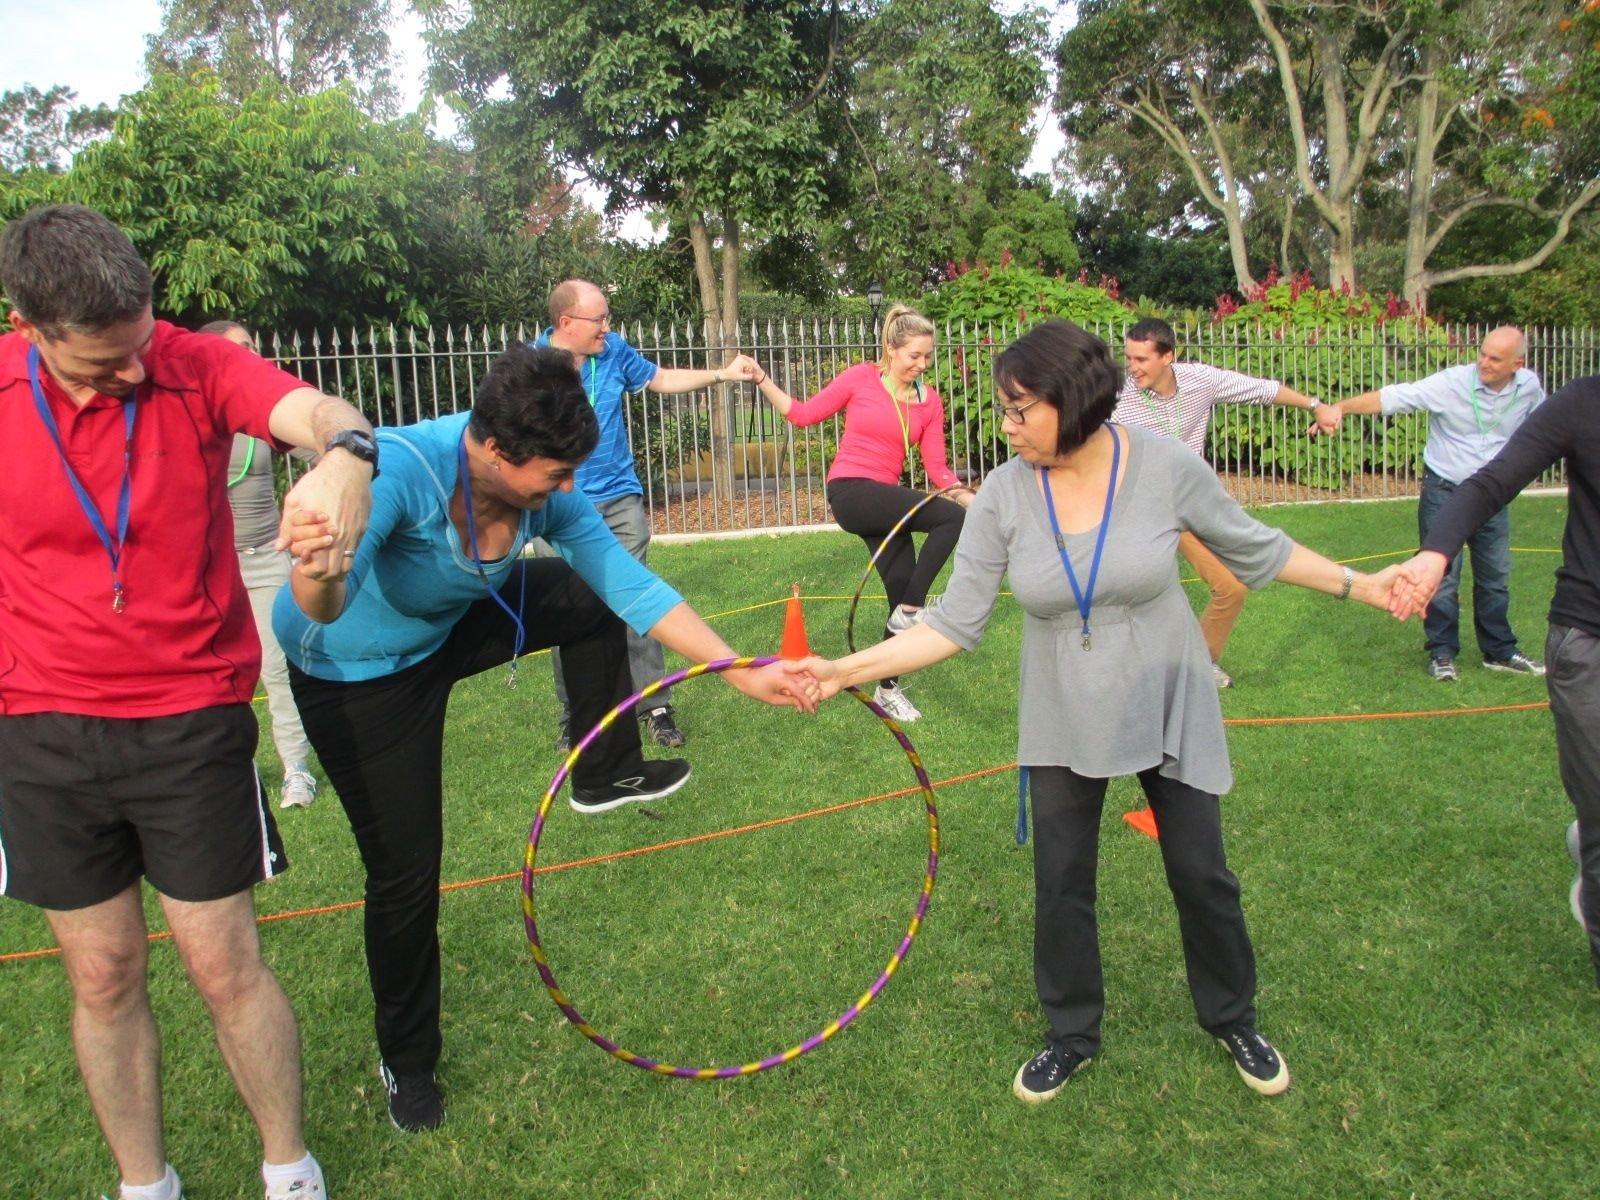 outdoor team building | outdoor team building activities, olympics